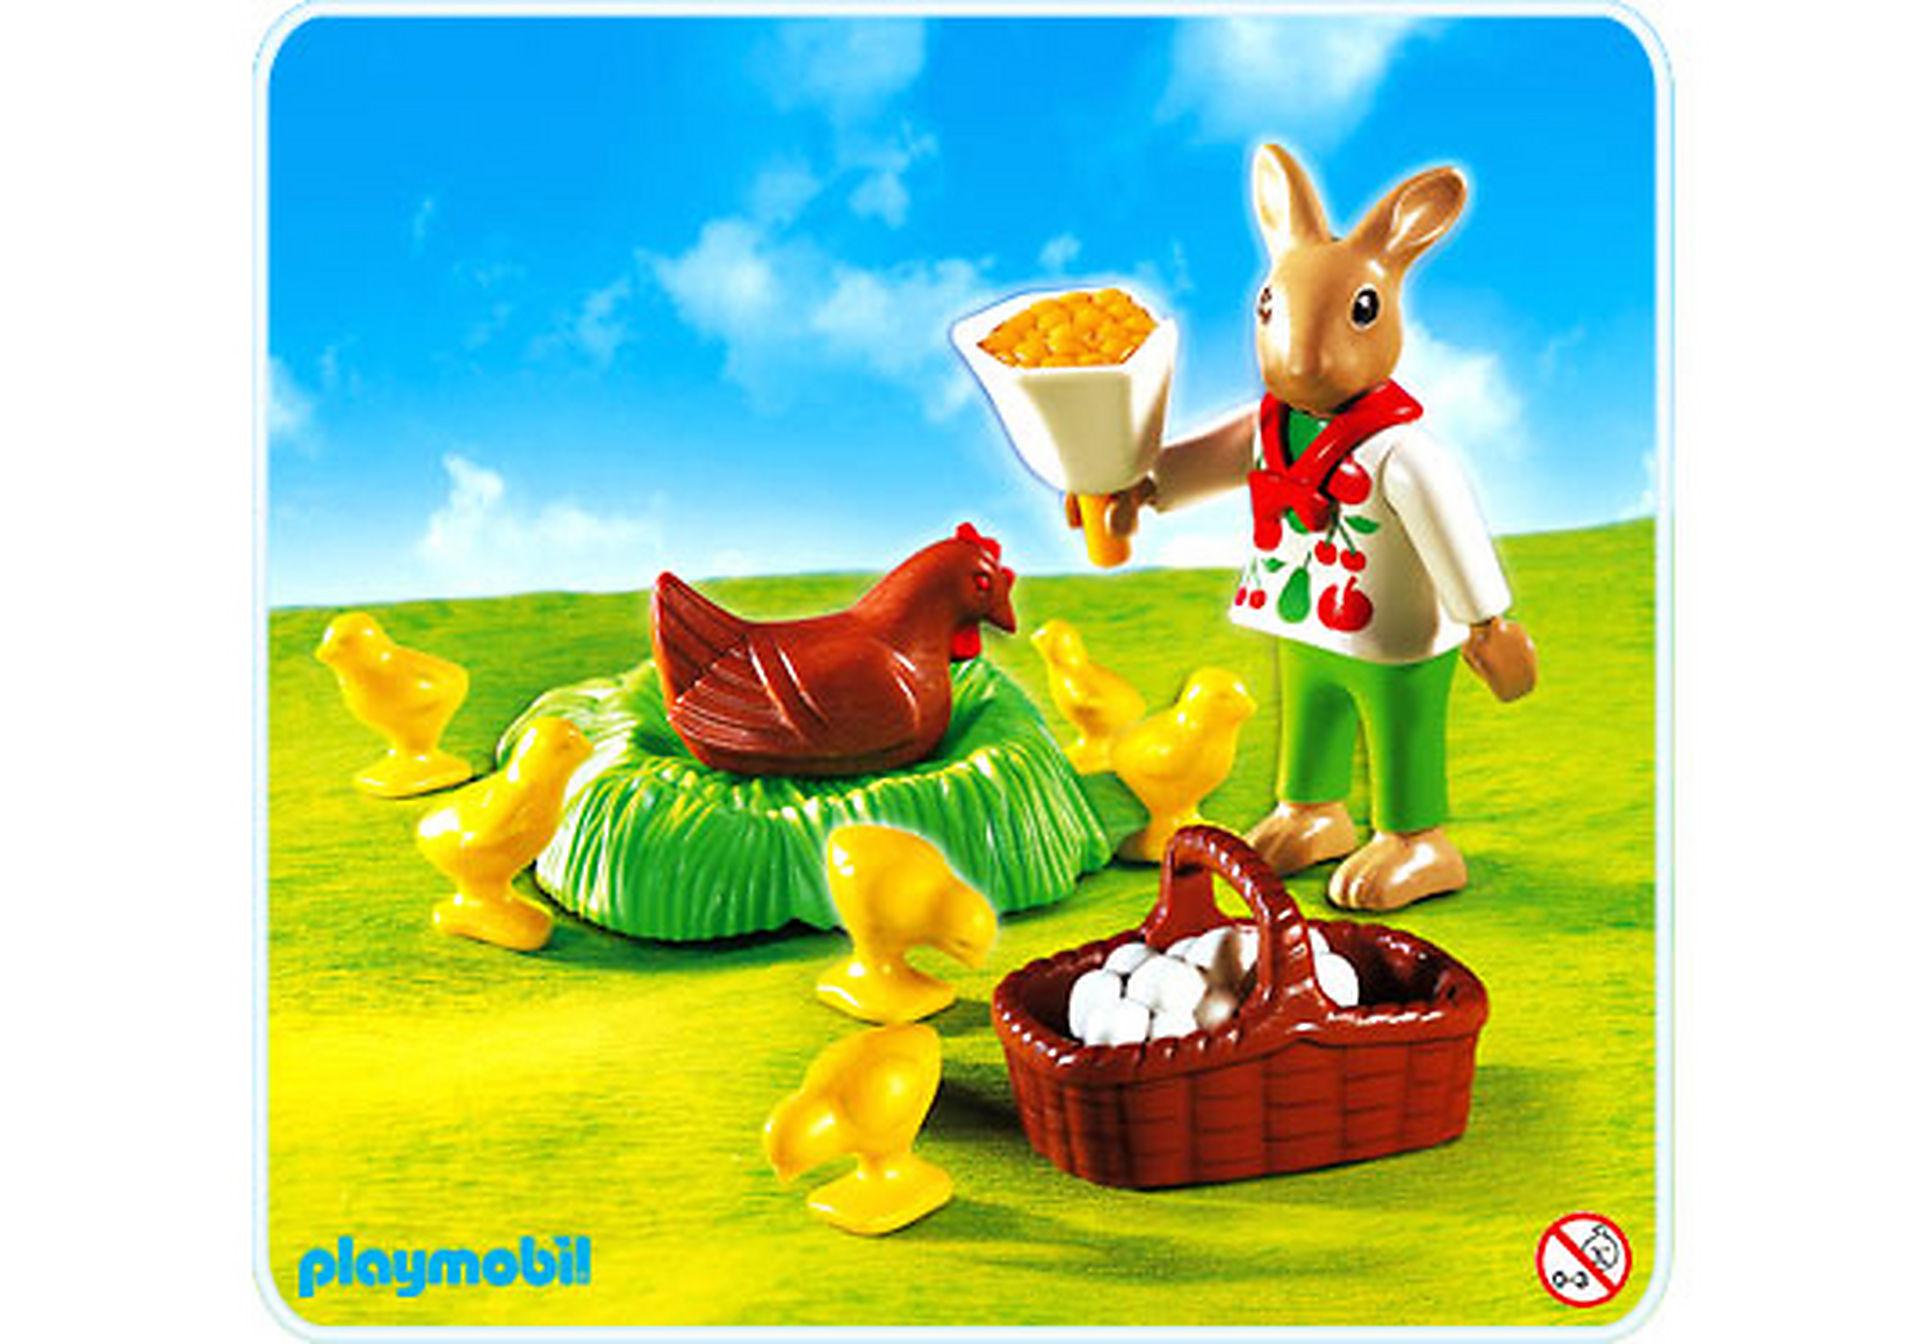 http://media.playmobil.com/i/playmobil/4452-A_product_detail/Osterhäschen mit Huhn und Kükenschar